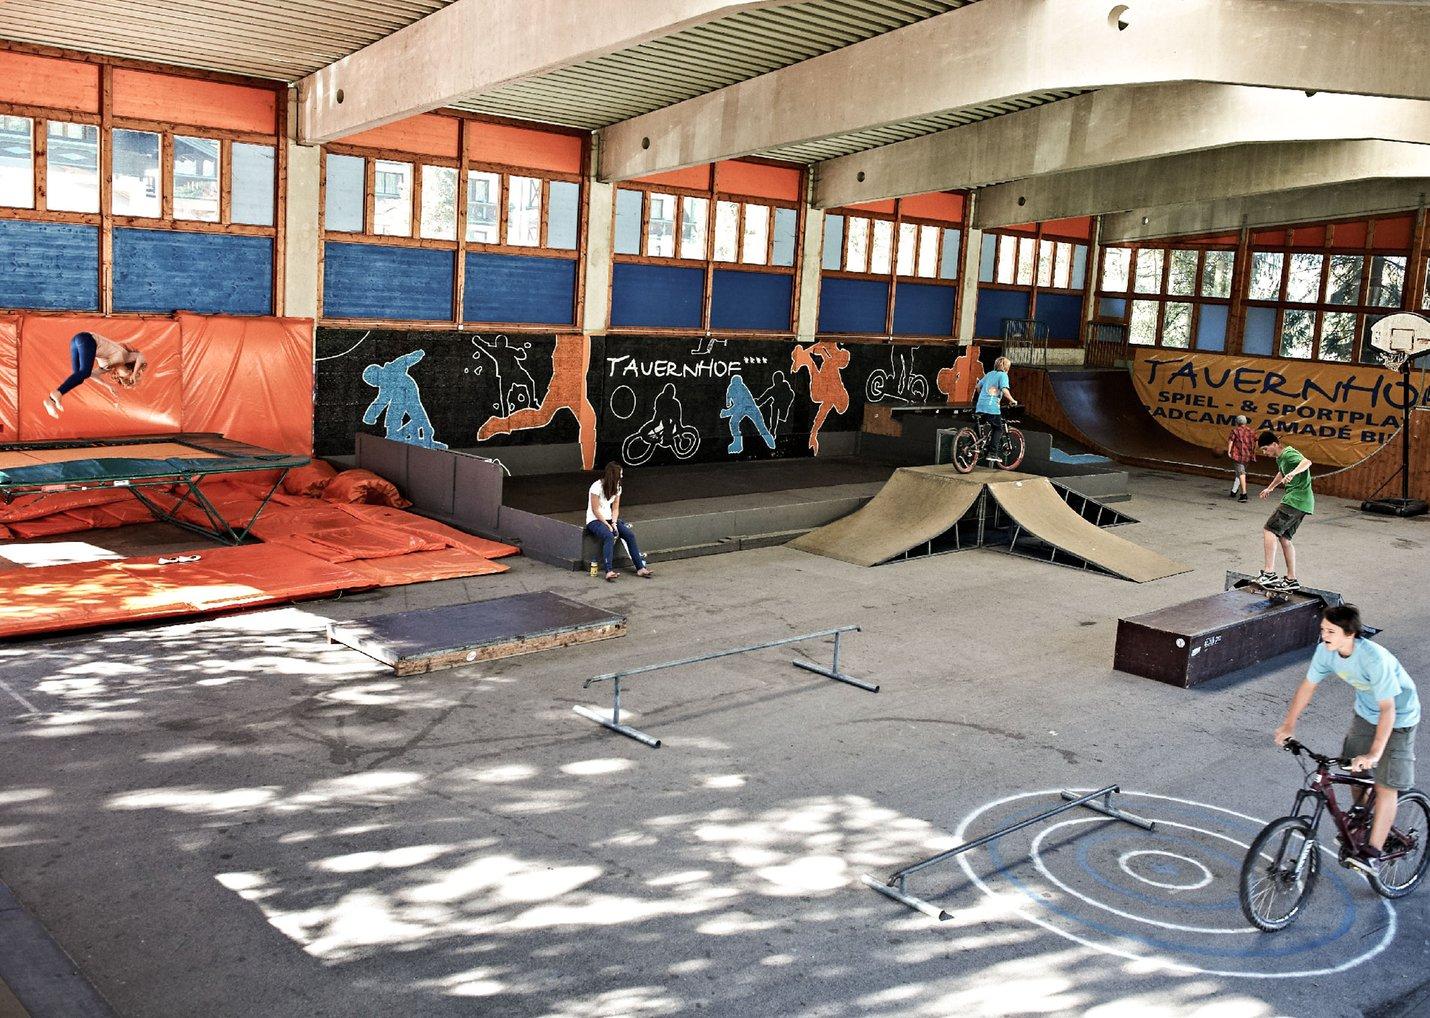 Funpark Skatepark Flachau Tauernhof hotel flachau sporthotel österreich